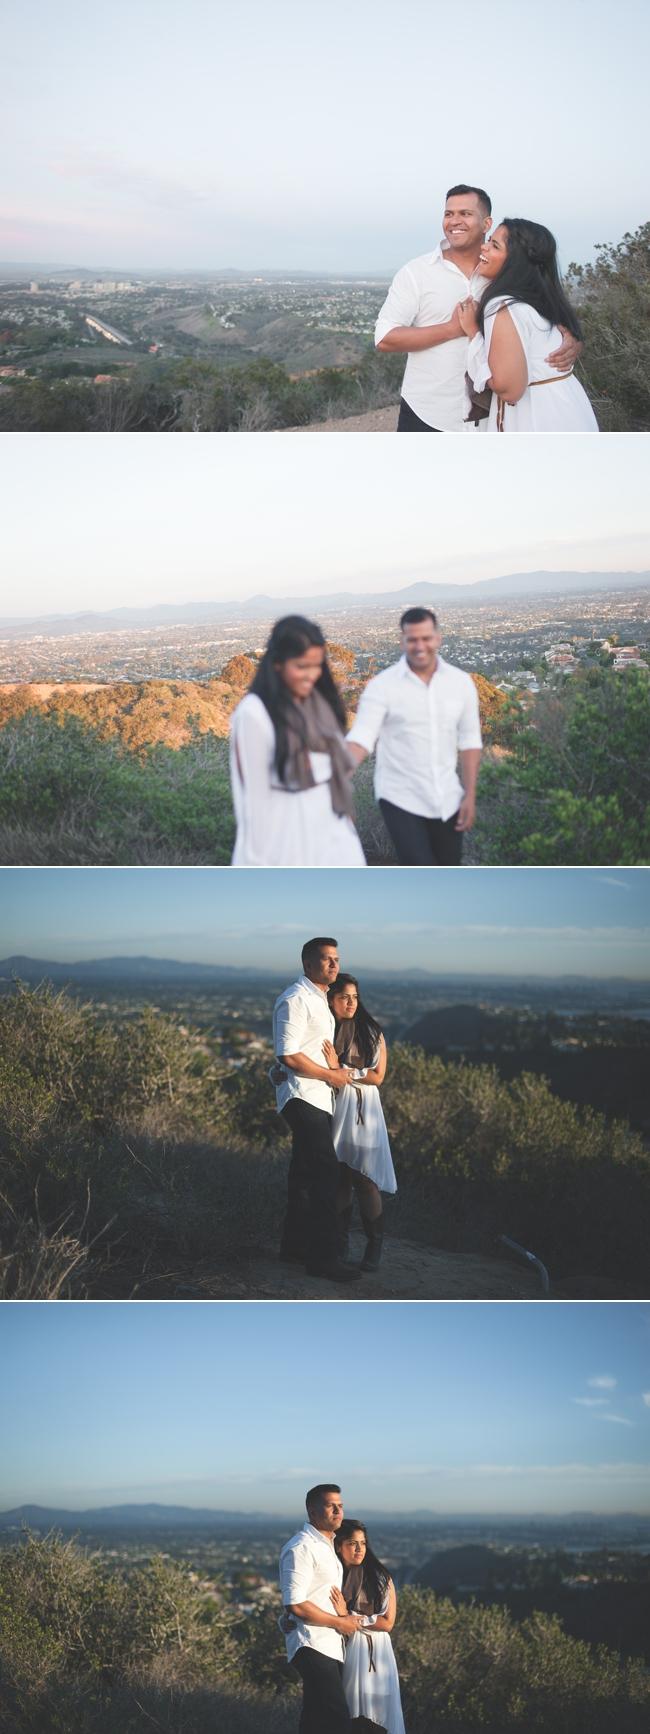 destination-wedding-photographers-california 22.jpg